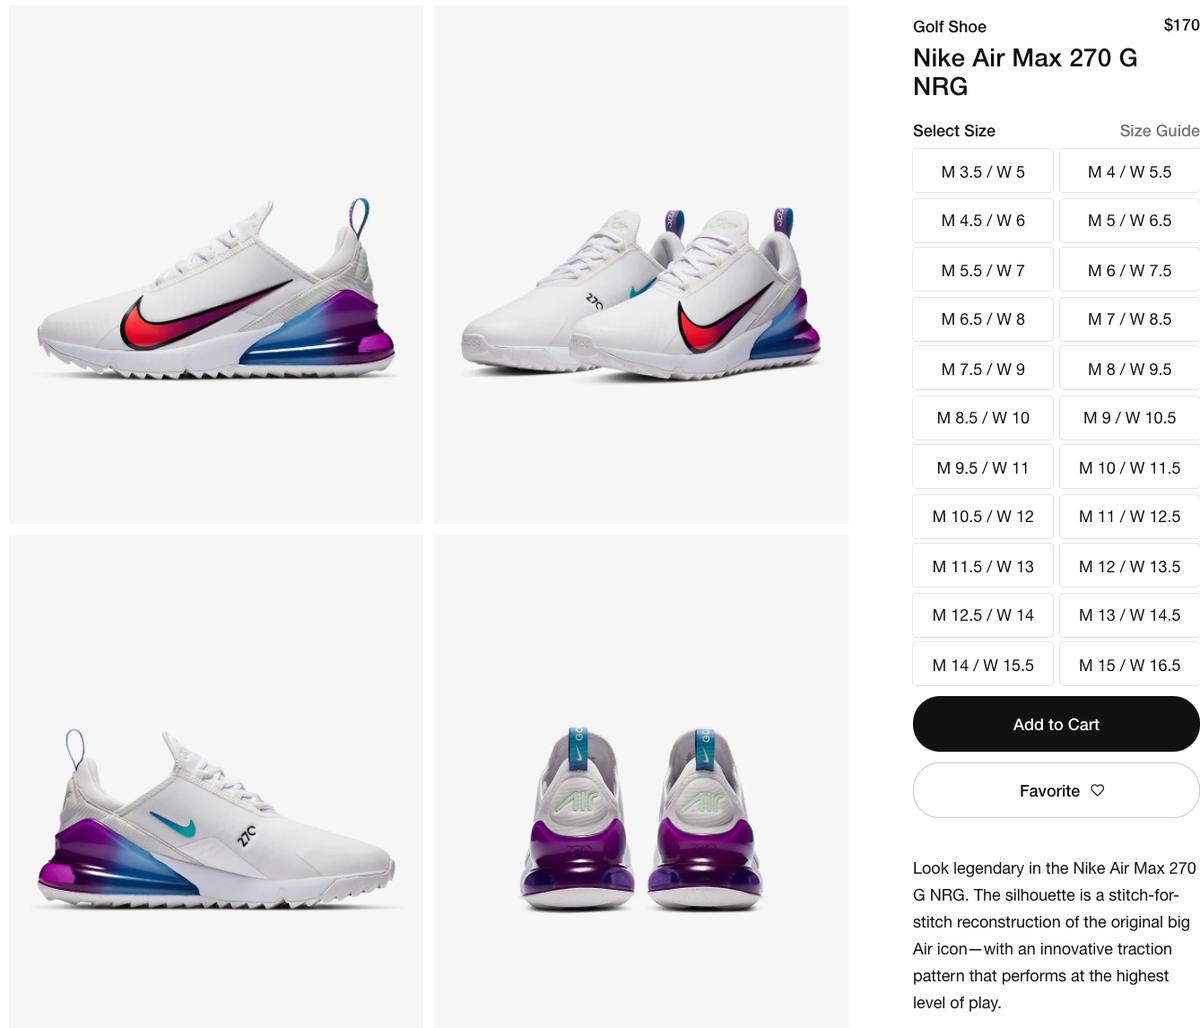 Sole Links On Twitter Ad Live Via Nike Us Nike Air Max 270 G Nrg Https T Co K994r3fspm Https T Co K994r3fspm Https T Co K994r3fspm Https T Co Mxa9wfpddt